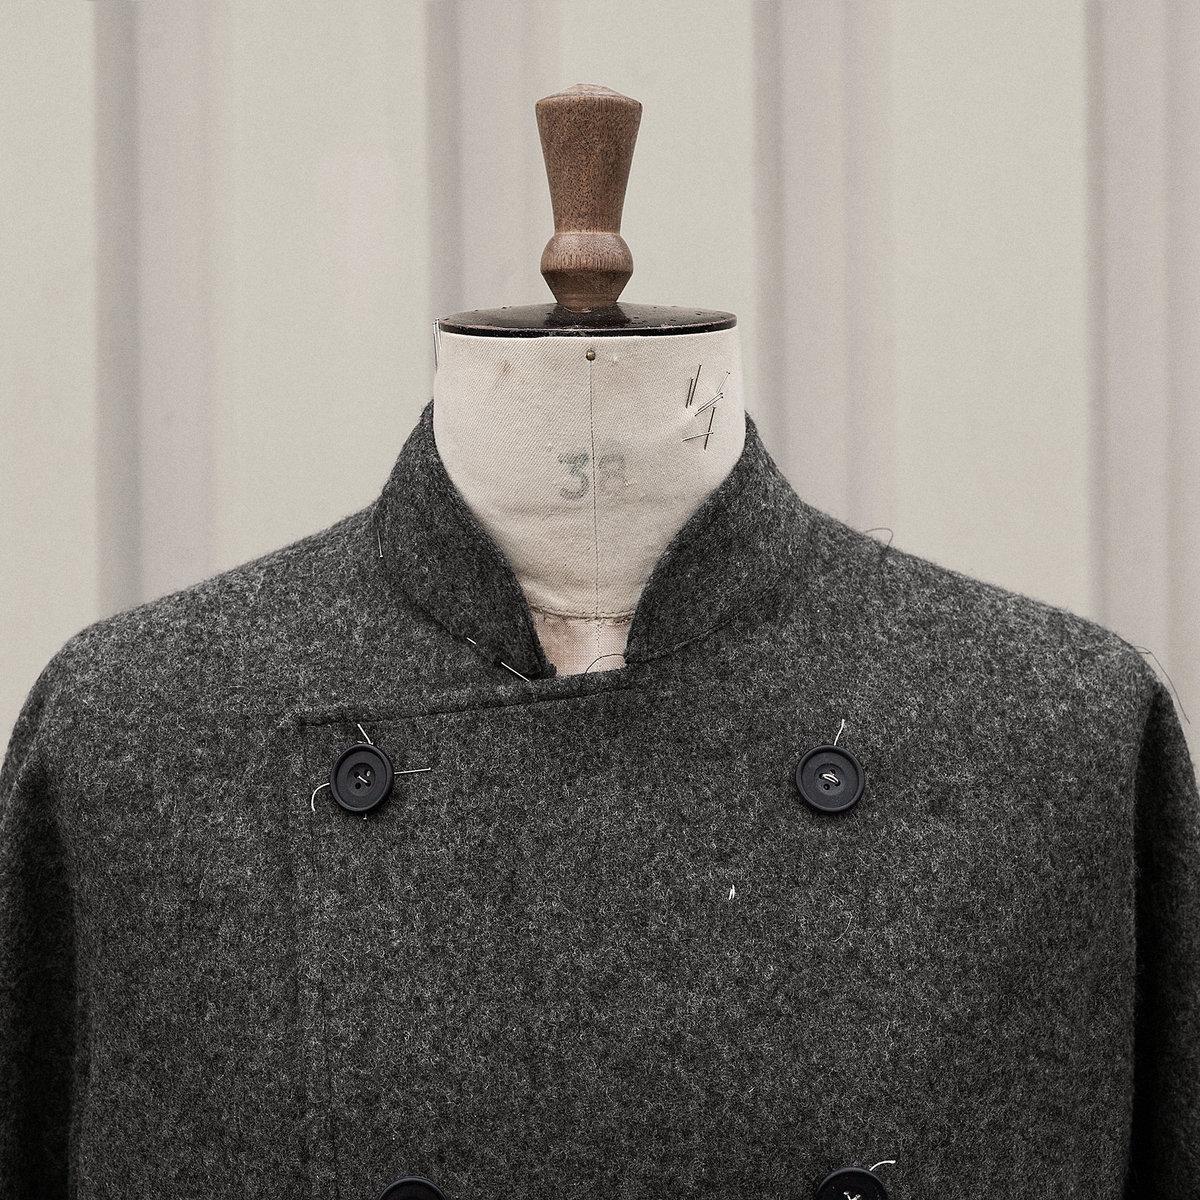 cooks-jacket-toile-3@2x copy.jpg